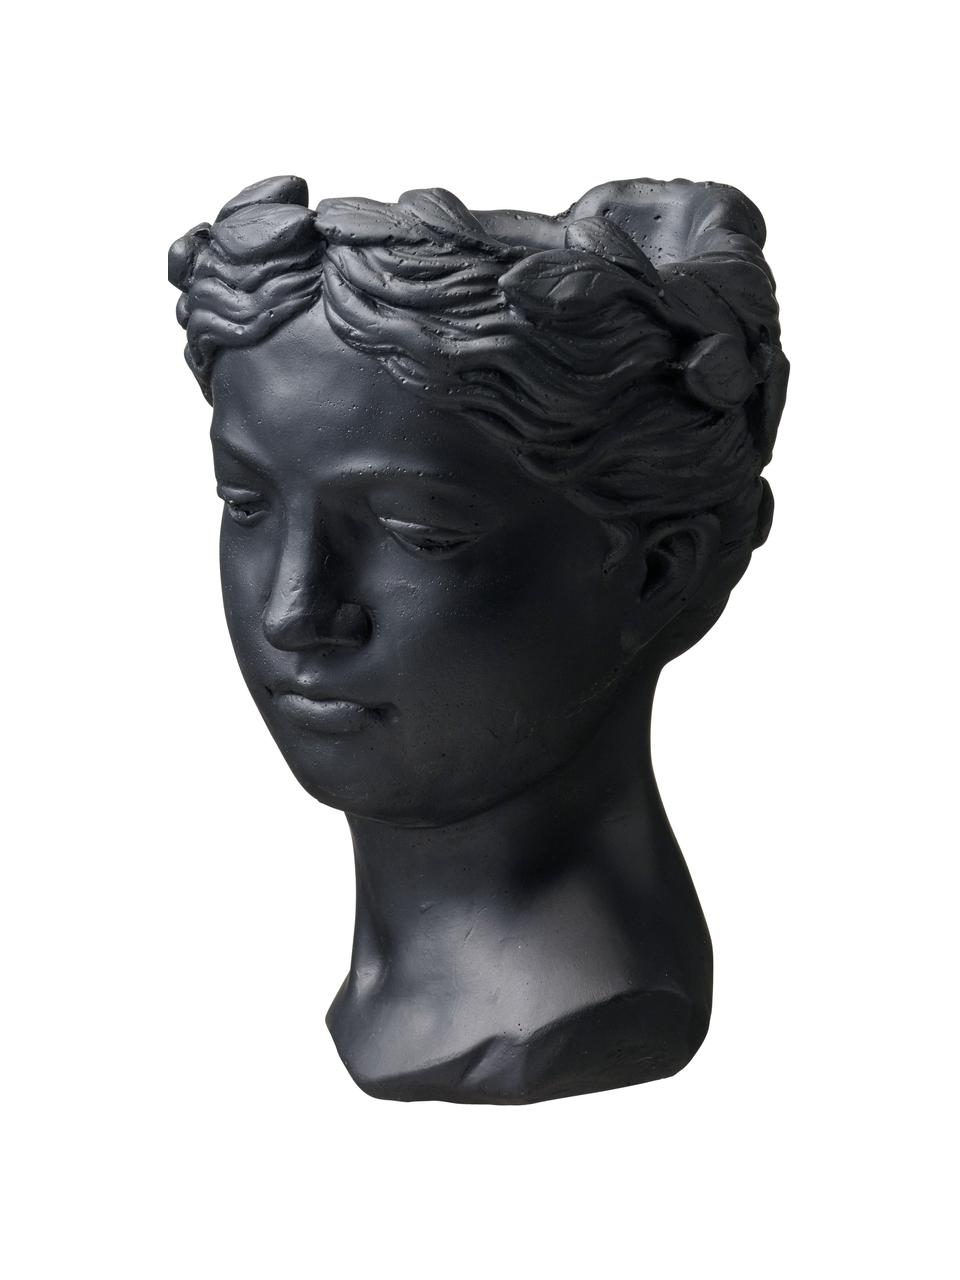 Übertopf Head, Beton, lackiert, Schwarz, 17 x 26 cm